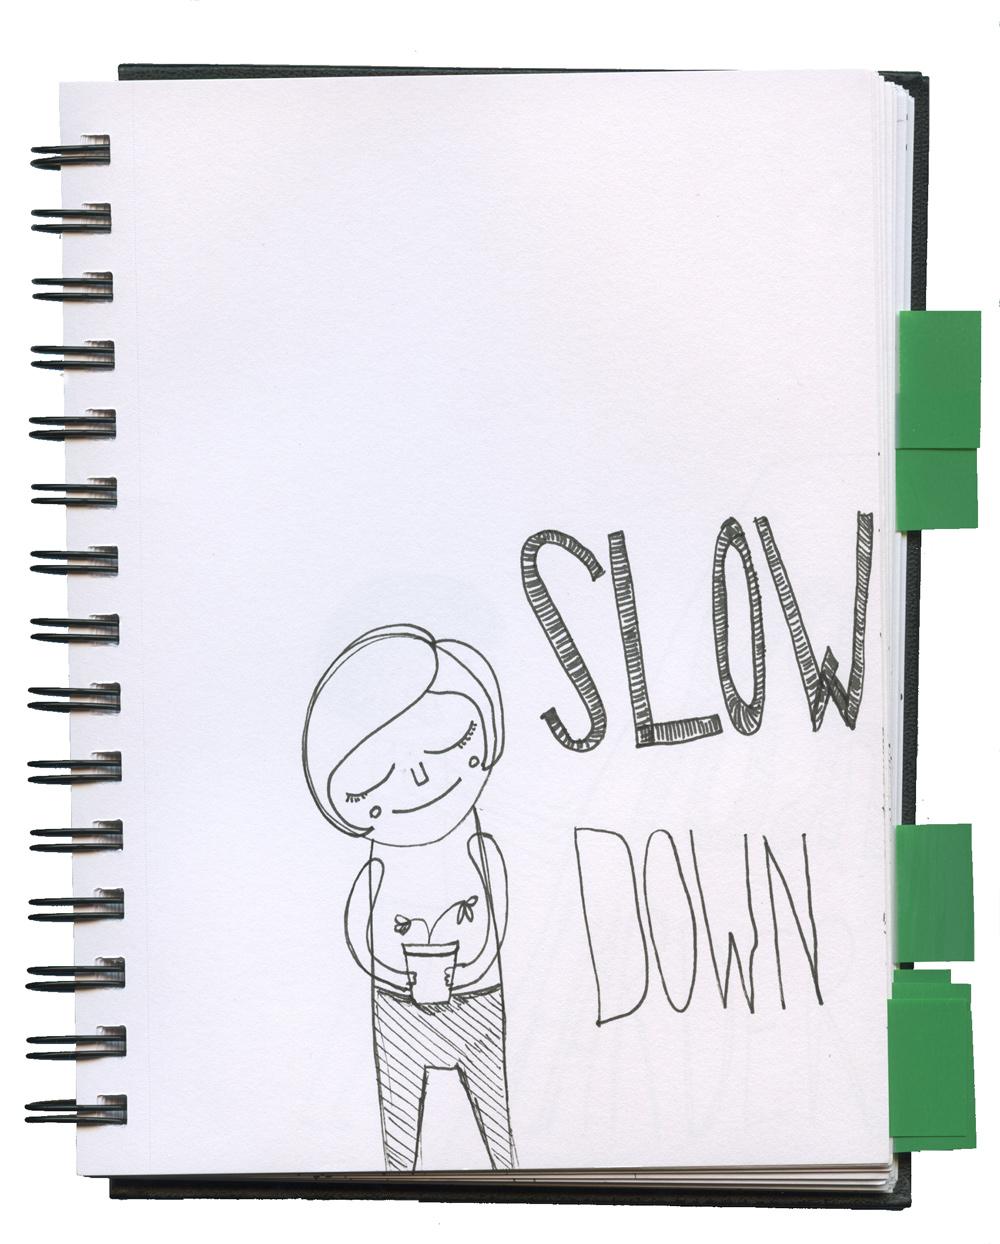 tbennett-sb-slow-down